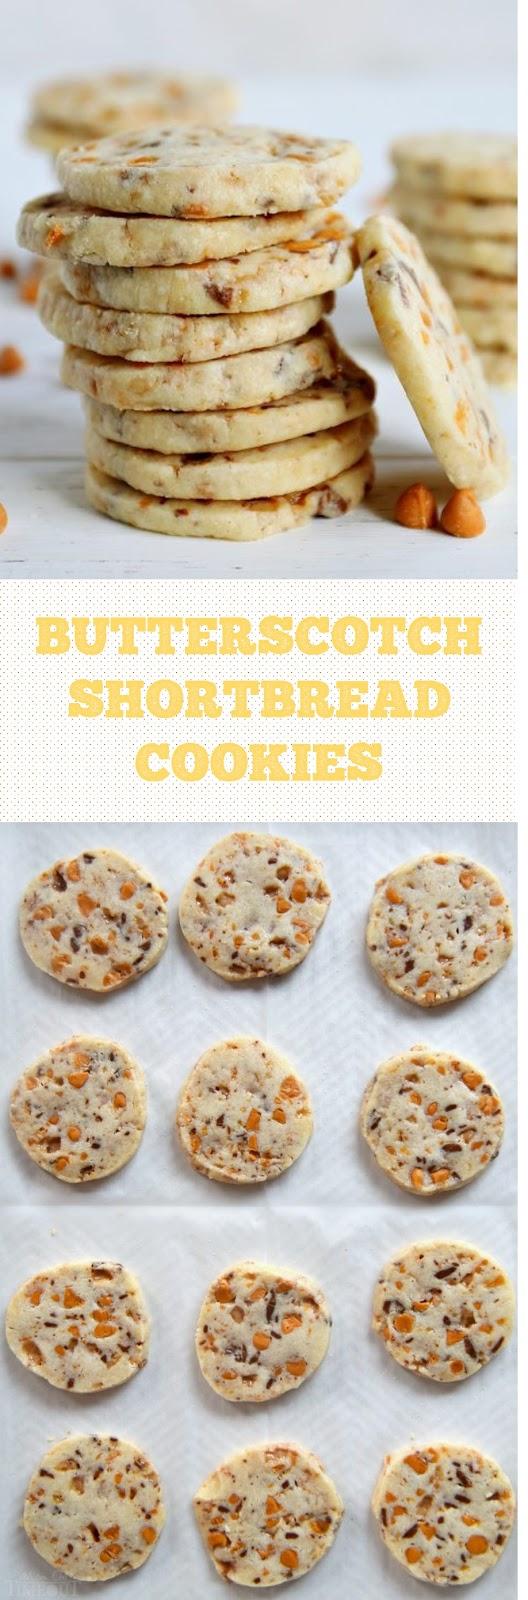 Butterscotch Shortbread Cookies